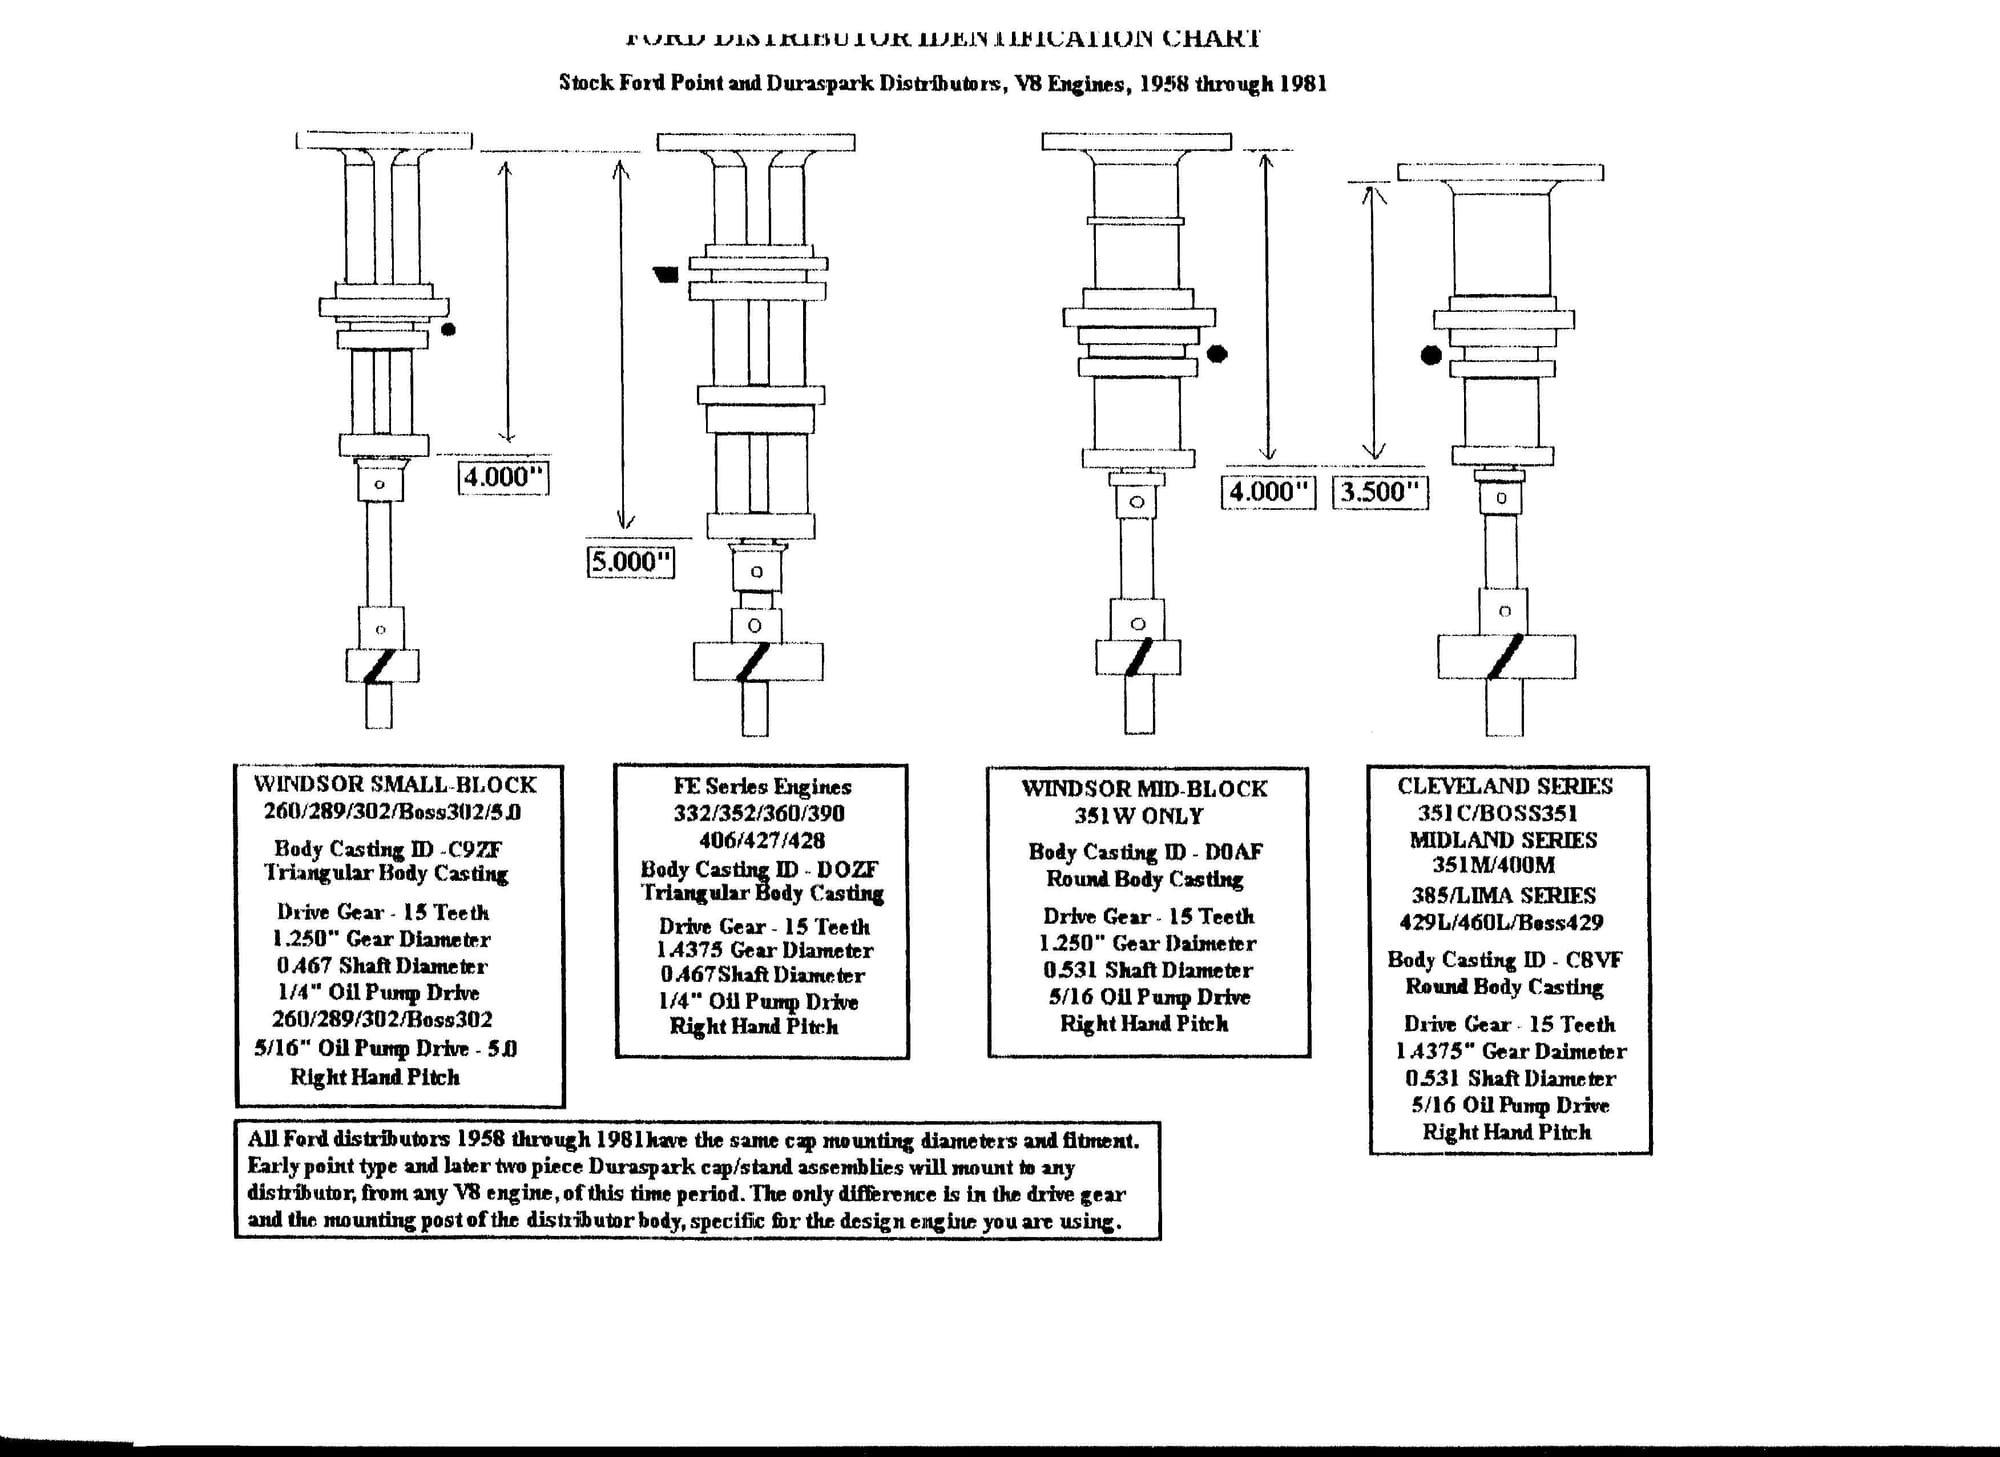 kenwood car stereo amplifier wiring diagram pdf with Tdwbd576z 2000w Scooter Wiring Diagram on Kicker Bass Station Wiring Diagram likewise Car Audio Wiring Diagram With Remote Manual likewise Kenwood Kac 7285 Wiring Diagram furthermore Envoy Bose Stereo Wiring Diagram further Tdwbd576z 2000w Scooter Wiring Diagram.